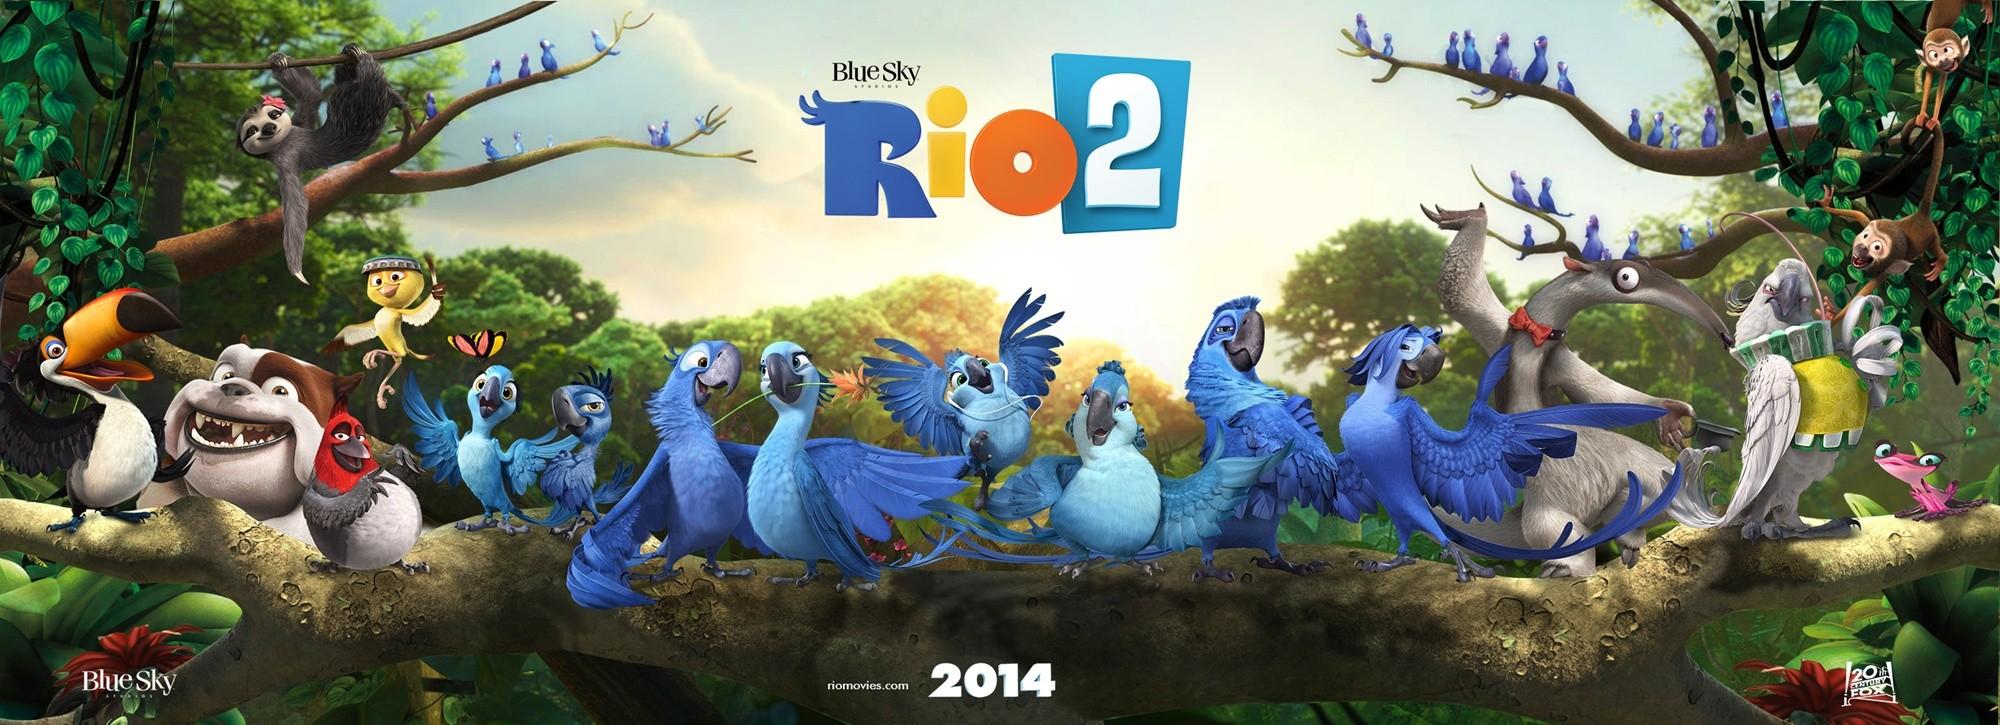 Resensi Film Rio 2 2014 Ristiirawan